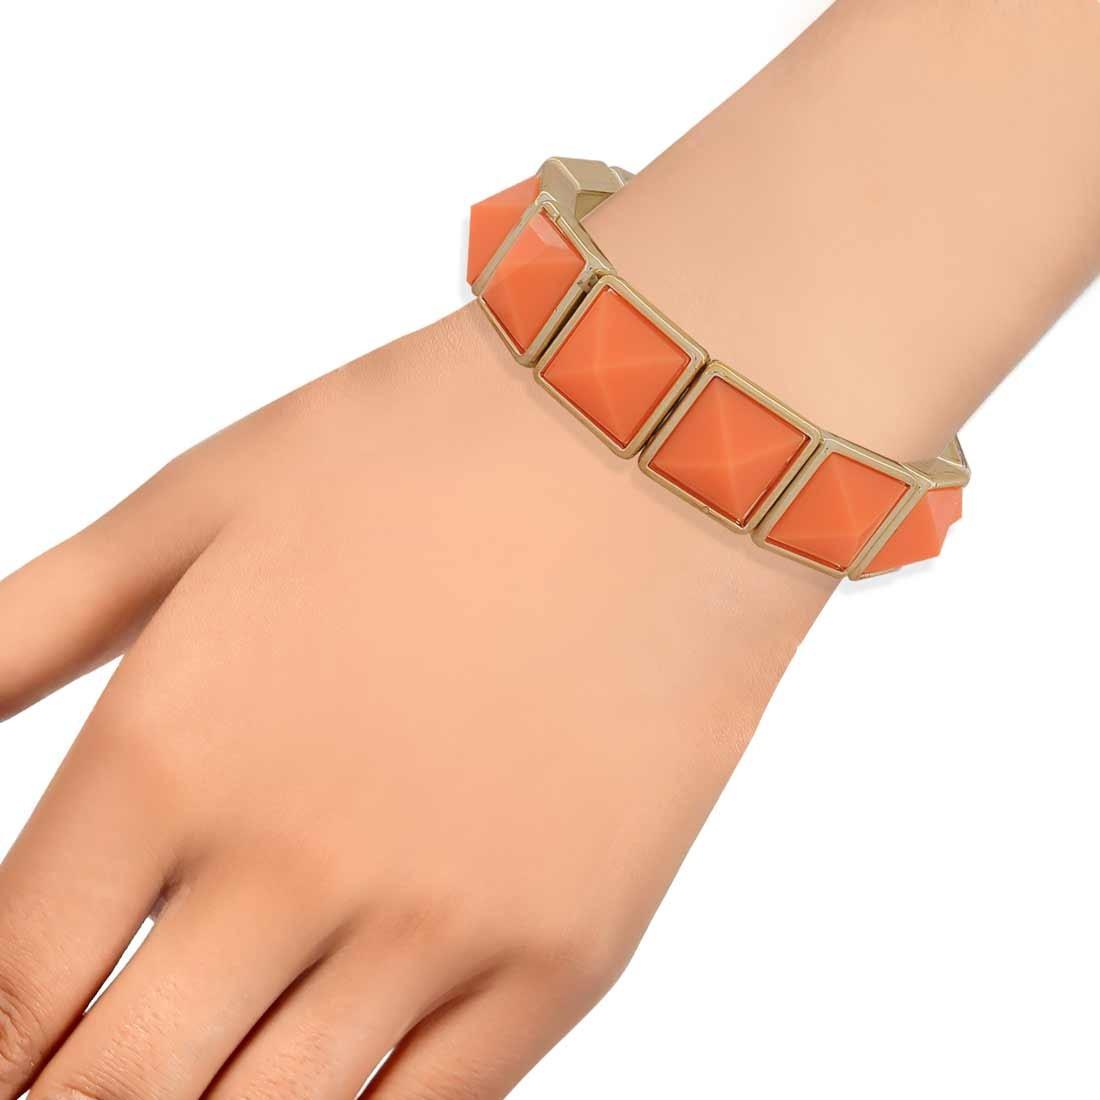 Sensual Orange Contemporary Adjustable College Bracelet Alloy Maayra MY6921